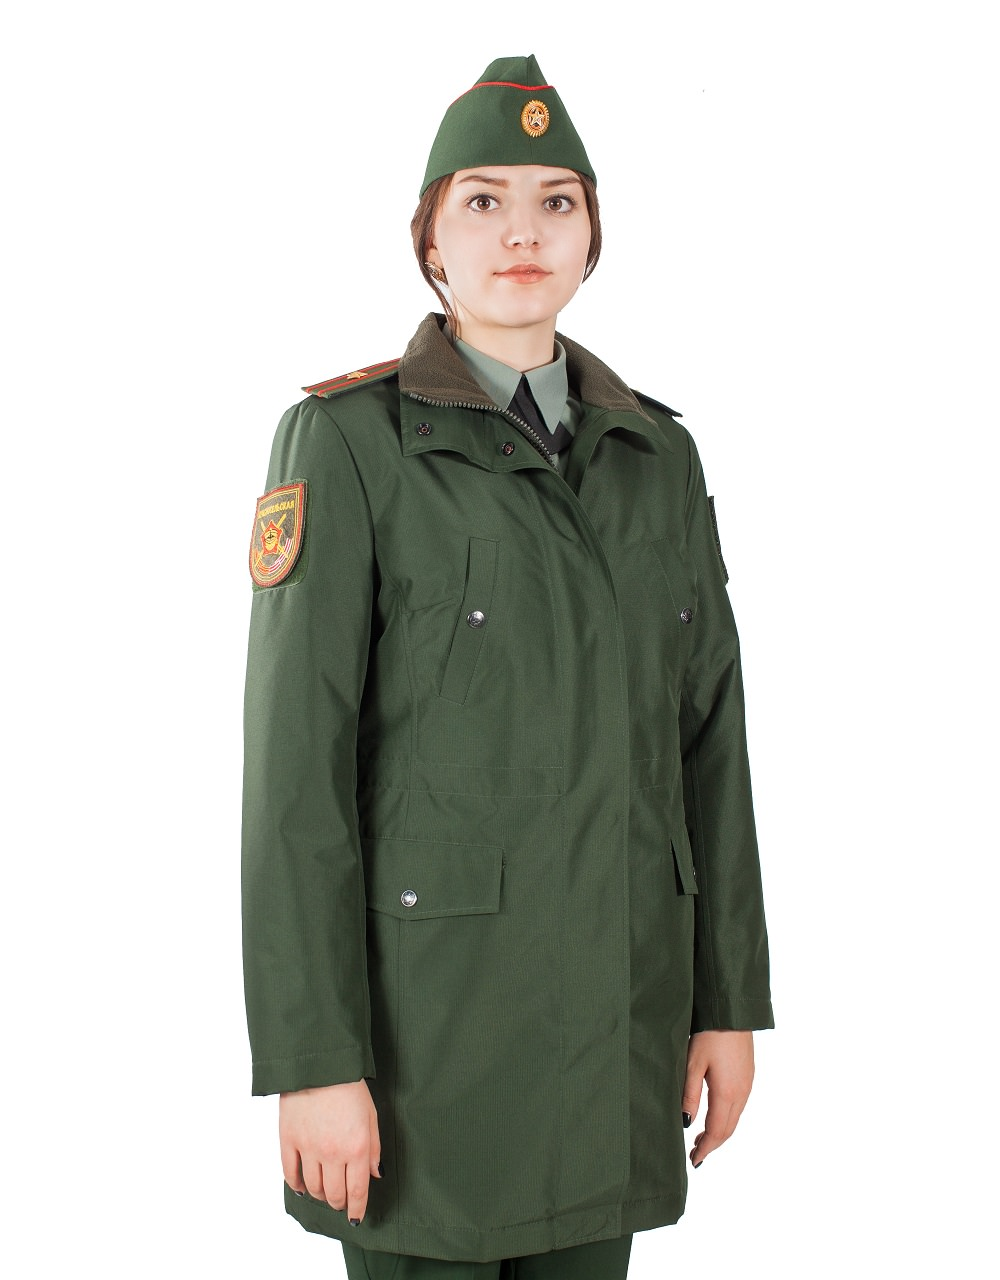 Куртка женская демисезонная МПА-59 (зеленый/рип-стоп) - артикул: 562130331